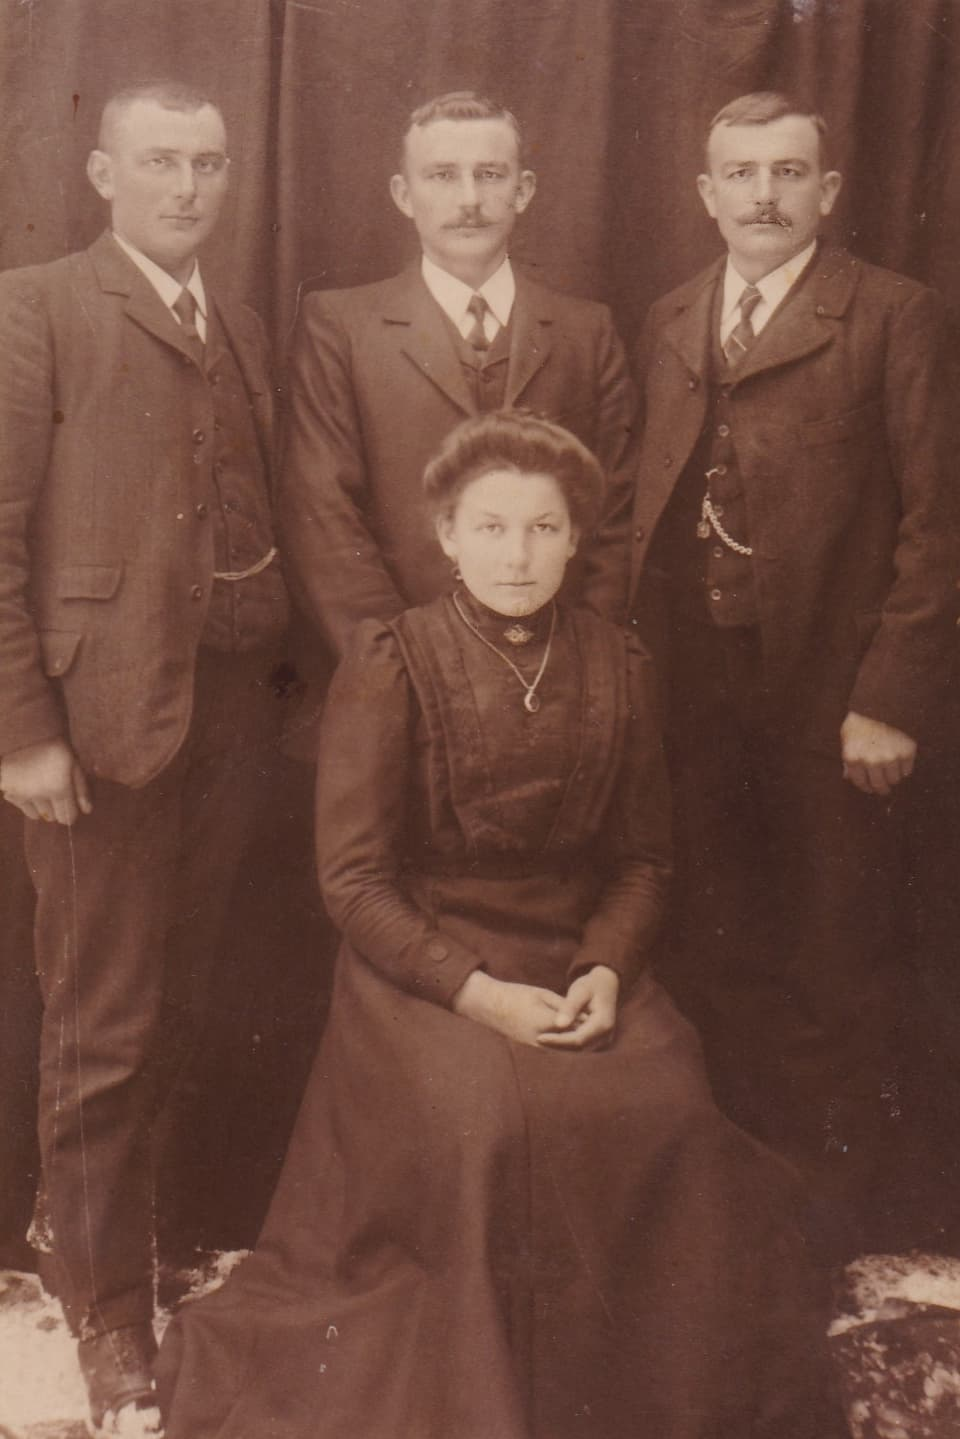 Ils uffants da Gion Placi e Marie Thérèse Louise Cadruvi: Placi, Pieder e Georges (davos da sanester). davant: Barla.